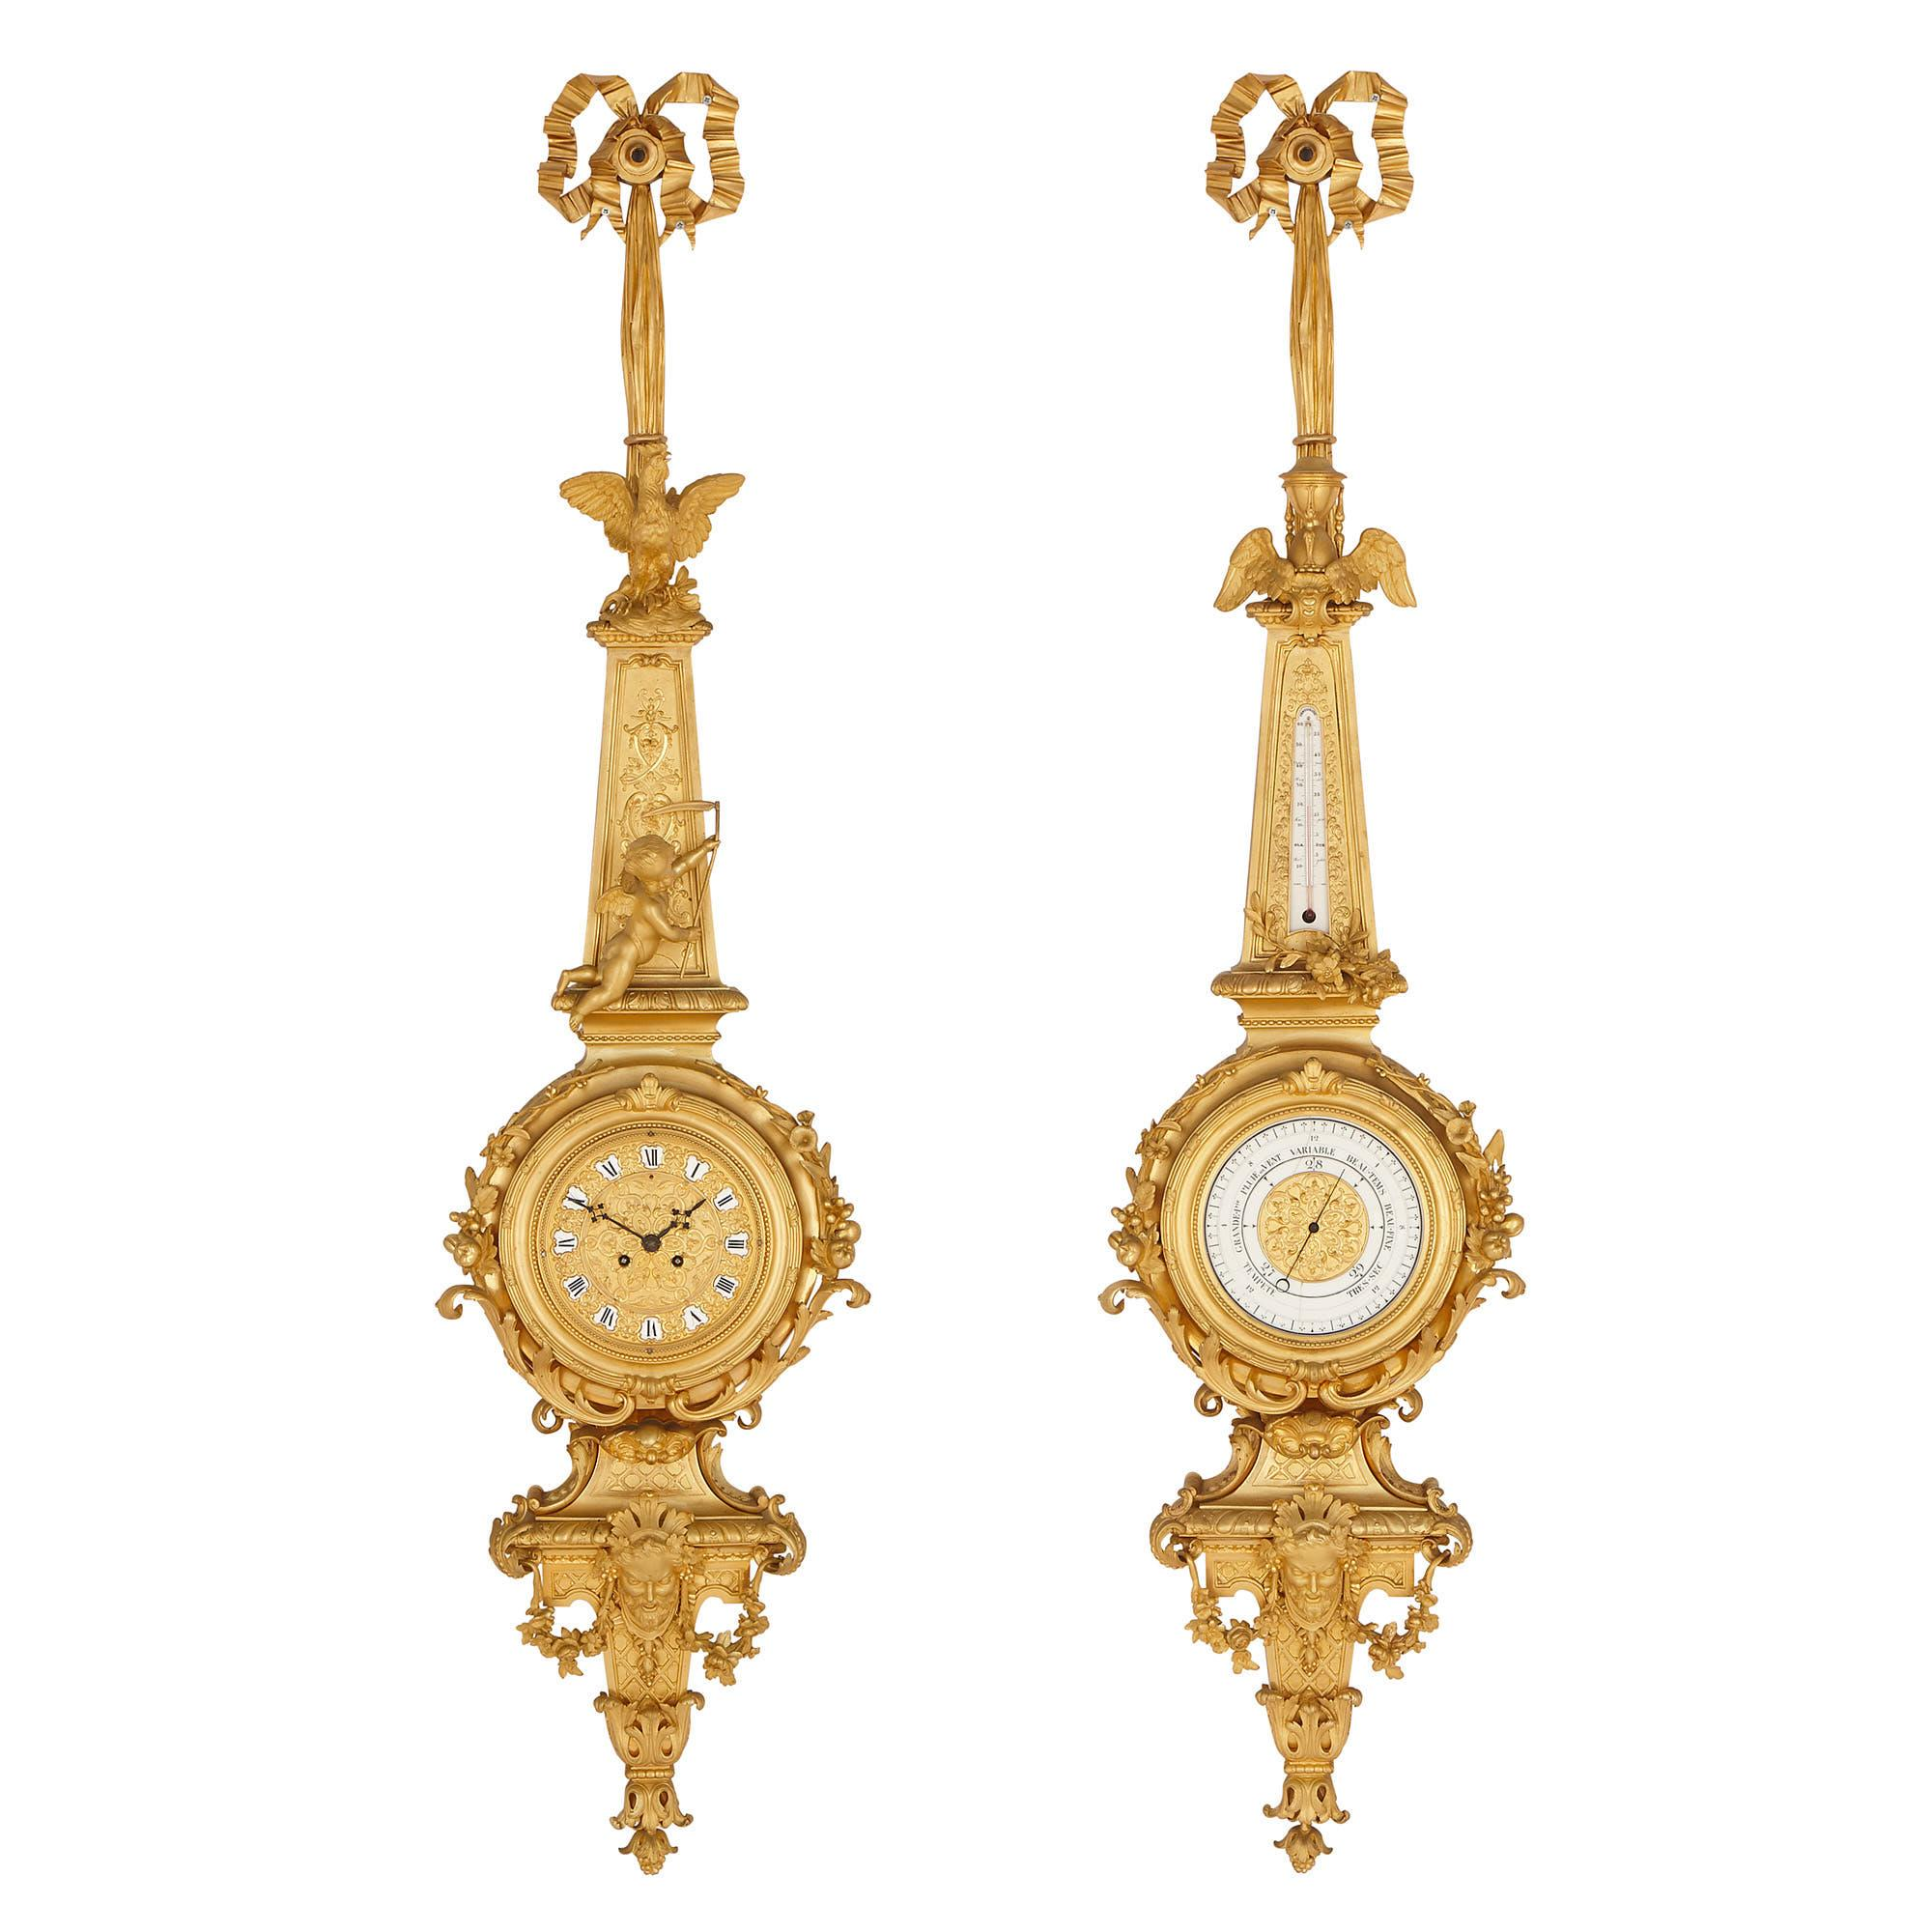 Napoleon III Period Gilt Bronze Clock and Barometer, Attributed to Raingo Frères